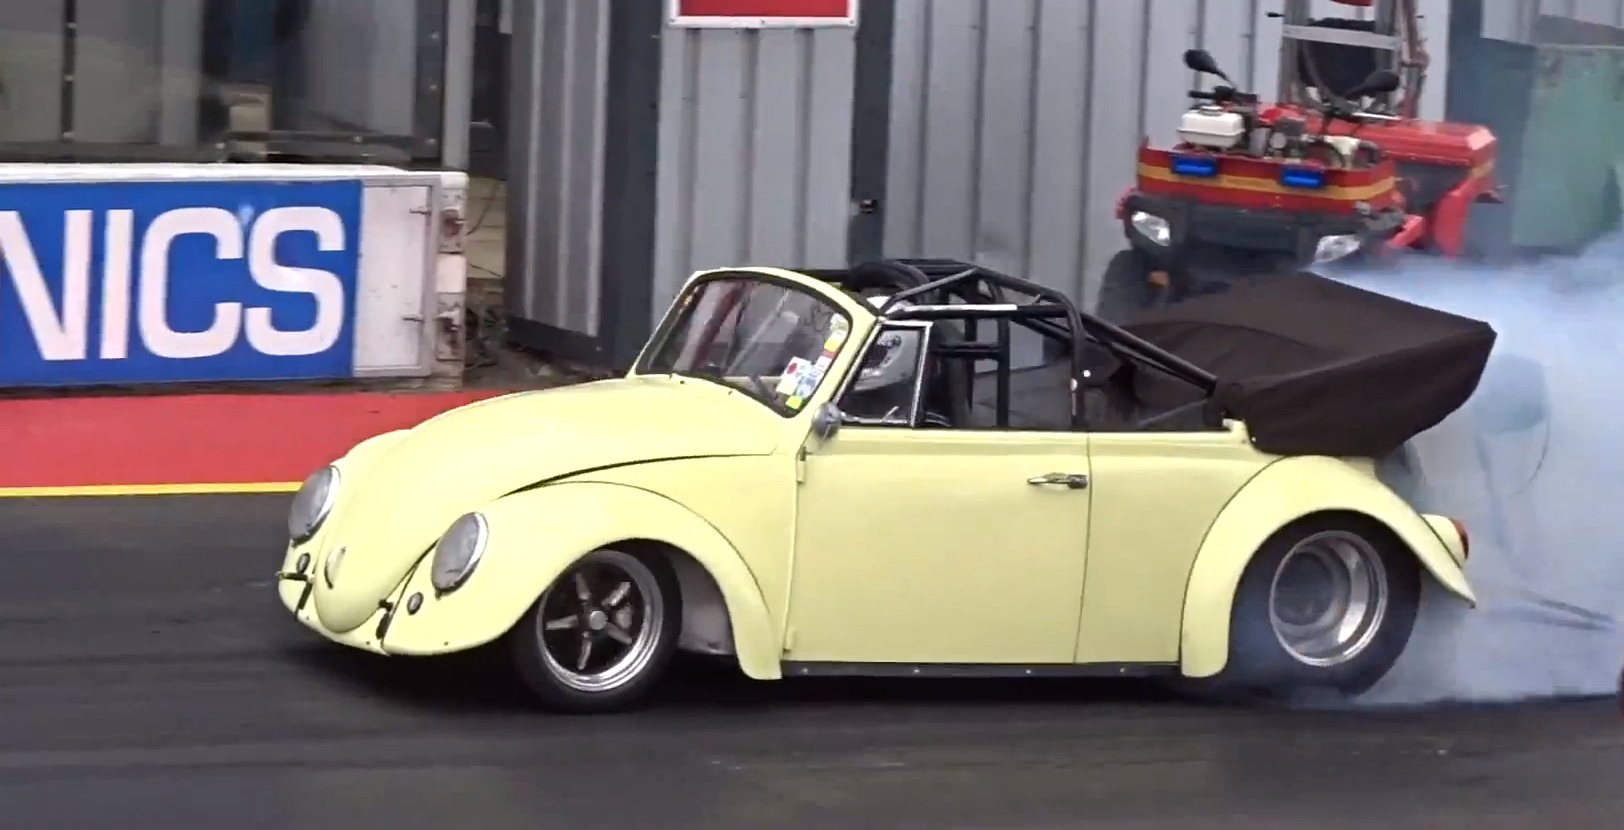 Vw Beetle Track Car >> 1960s VW Beetle Cabrio Gets Extreme Turbo Tune, Runs 8s Quarter Mile - Video - autoevolution